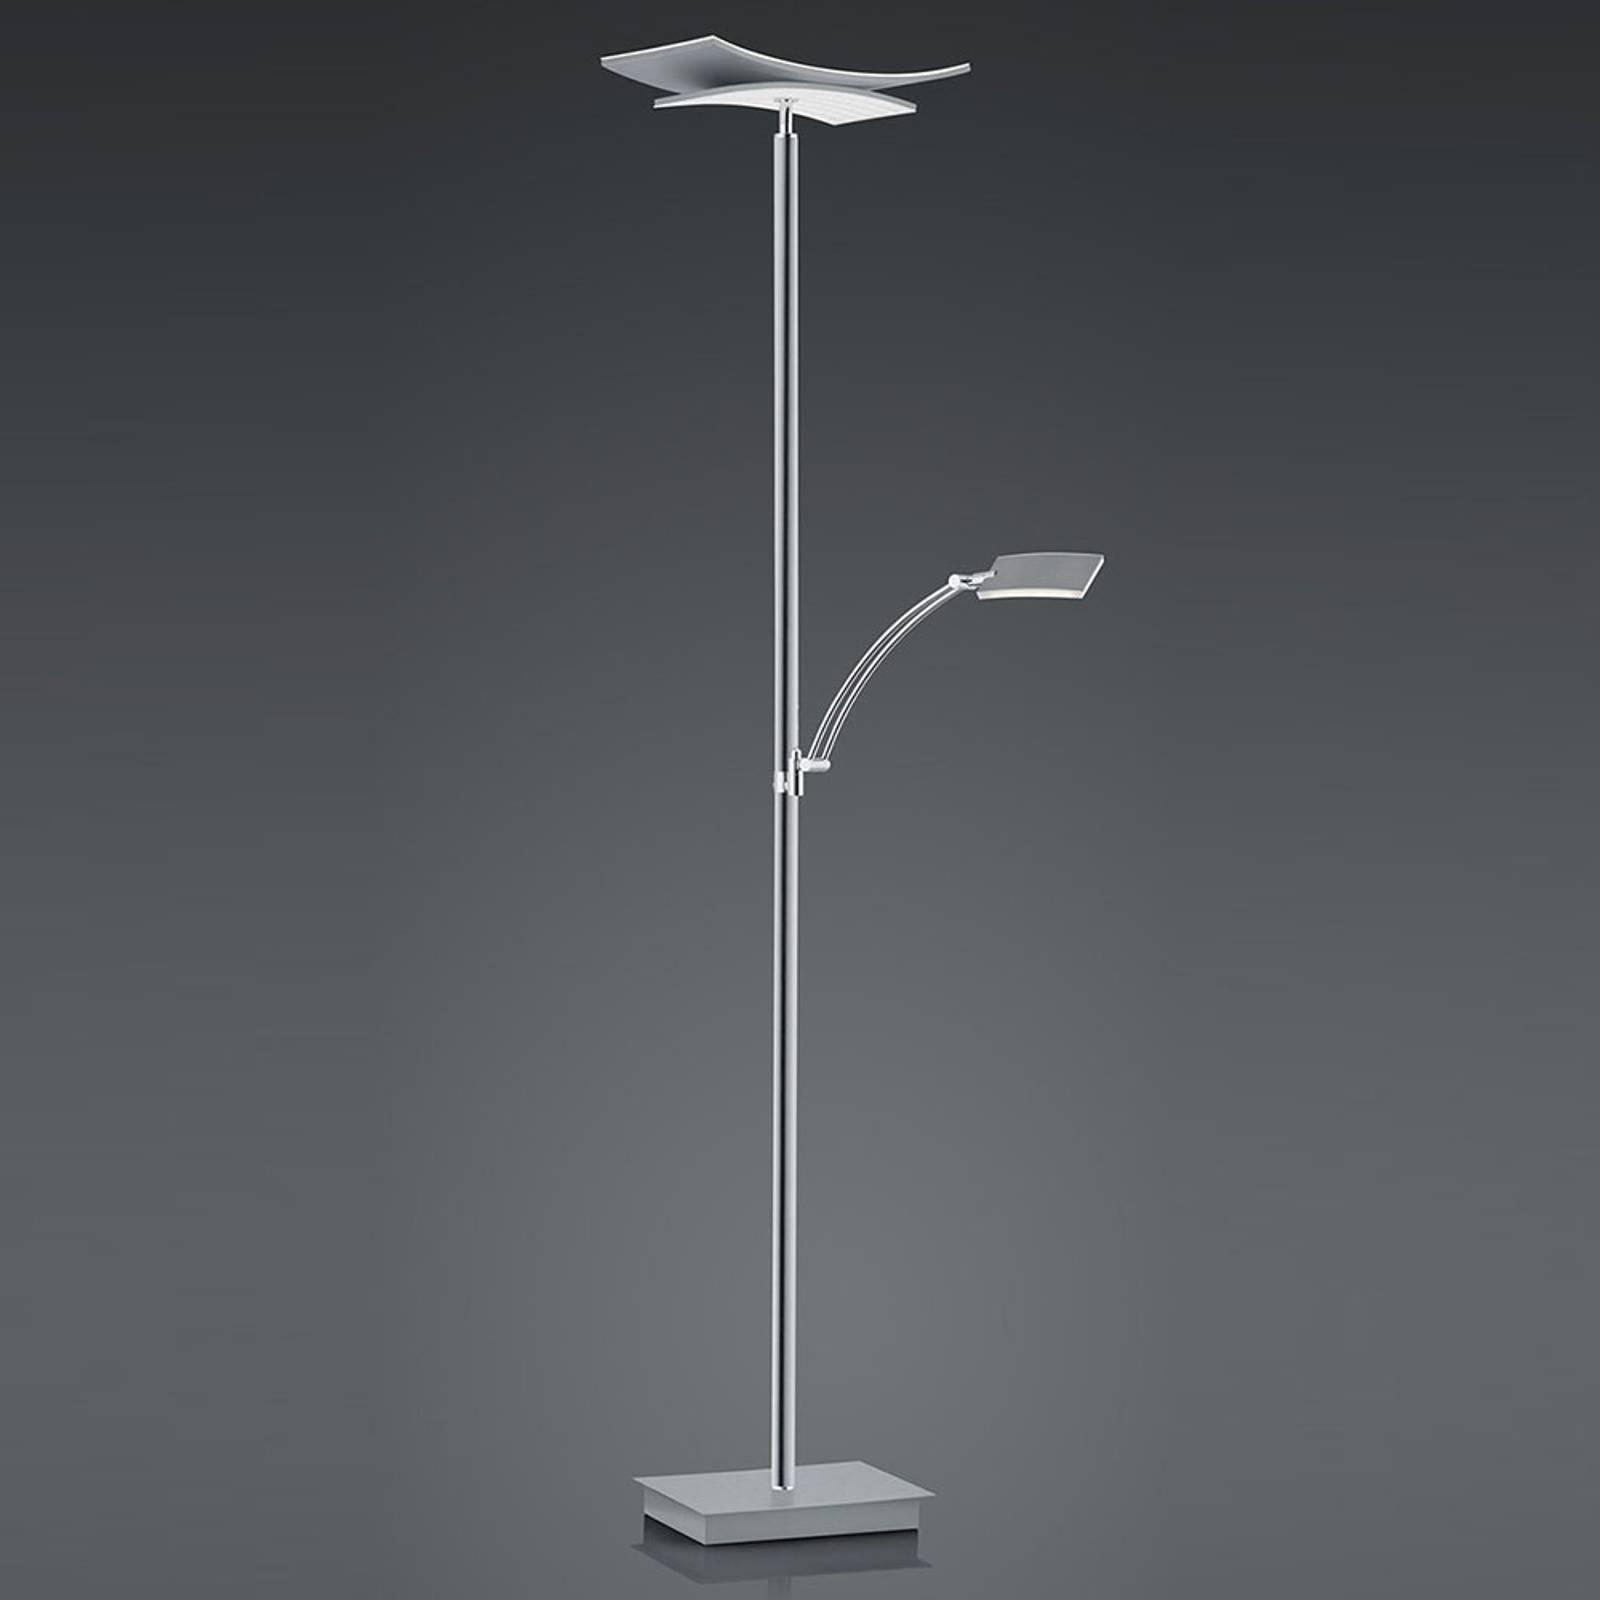 B-Leuchten Liberty LED-gulvlampe lesearm nikkel